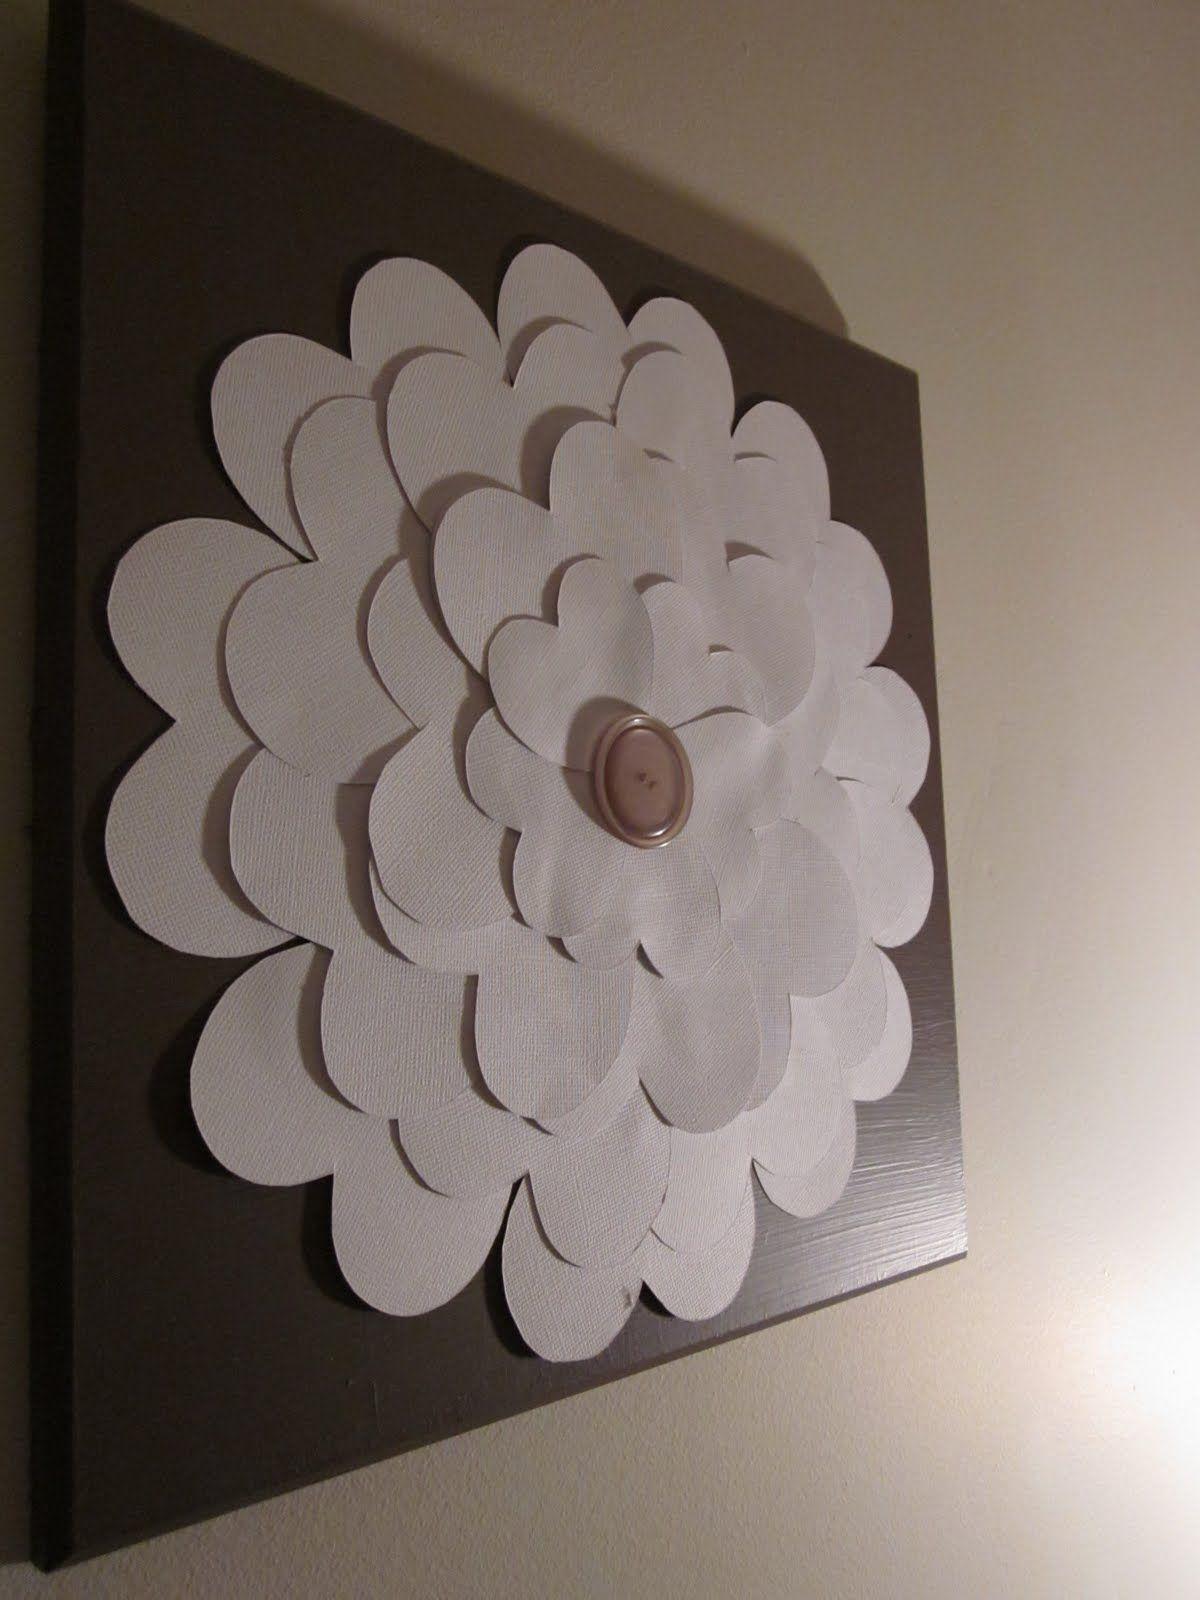 Cardboard scrapbook paper wall art pretty flower wall art cardboard scrapbook paper wall art pretty flower wall art christinas adventures dhlflorist Images